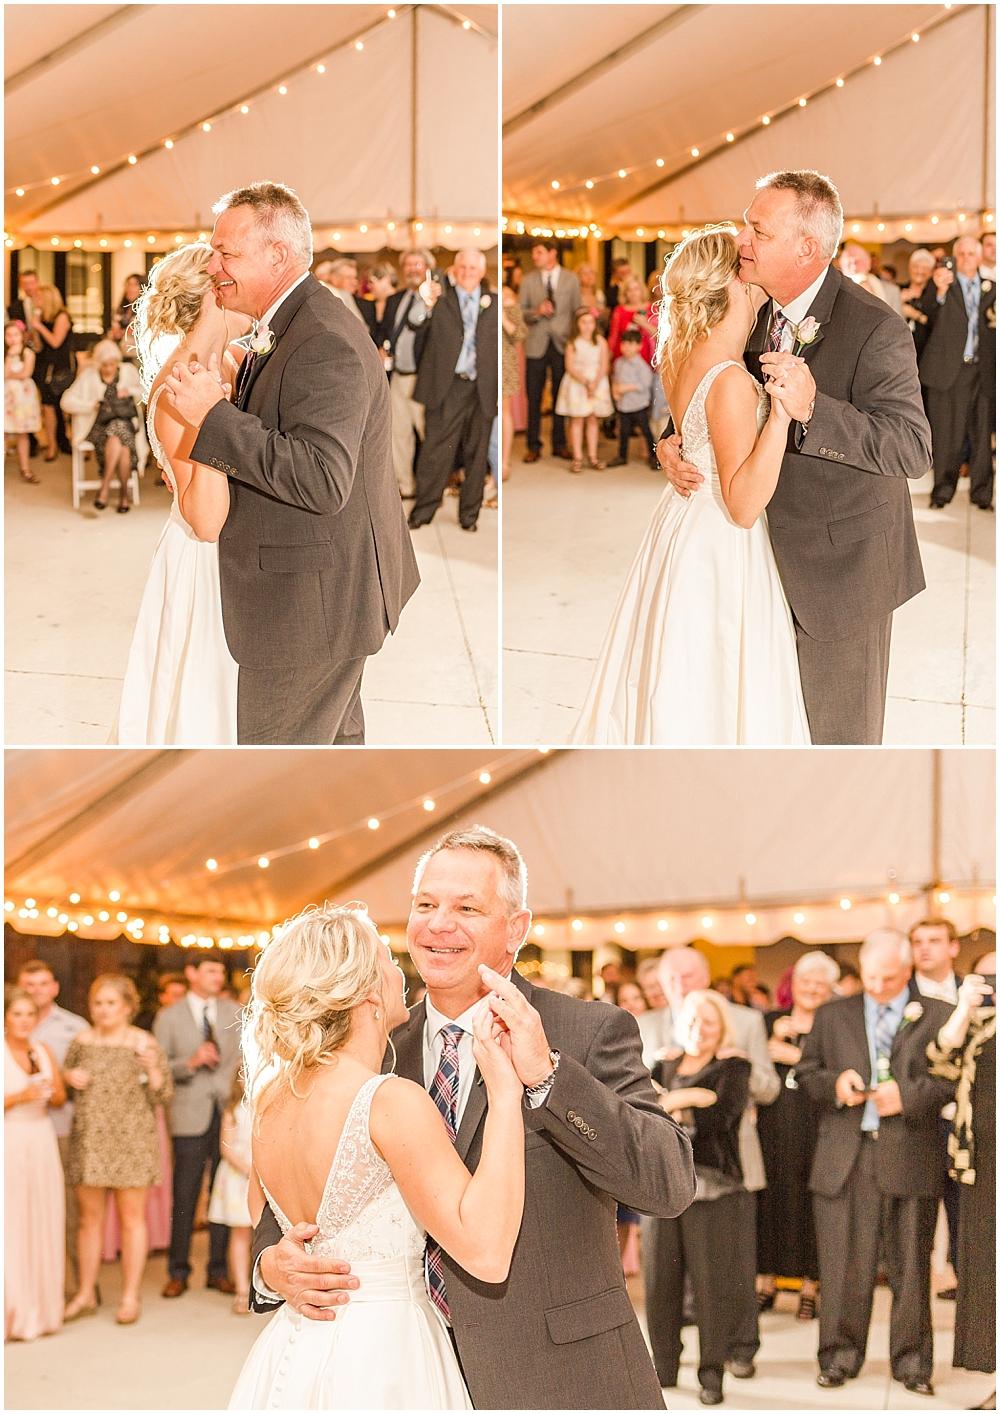 Ashton-Clark-Photography-Wedding-Portrait-Family-Photographer-Mobile-Alabama_0363.jpg